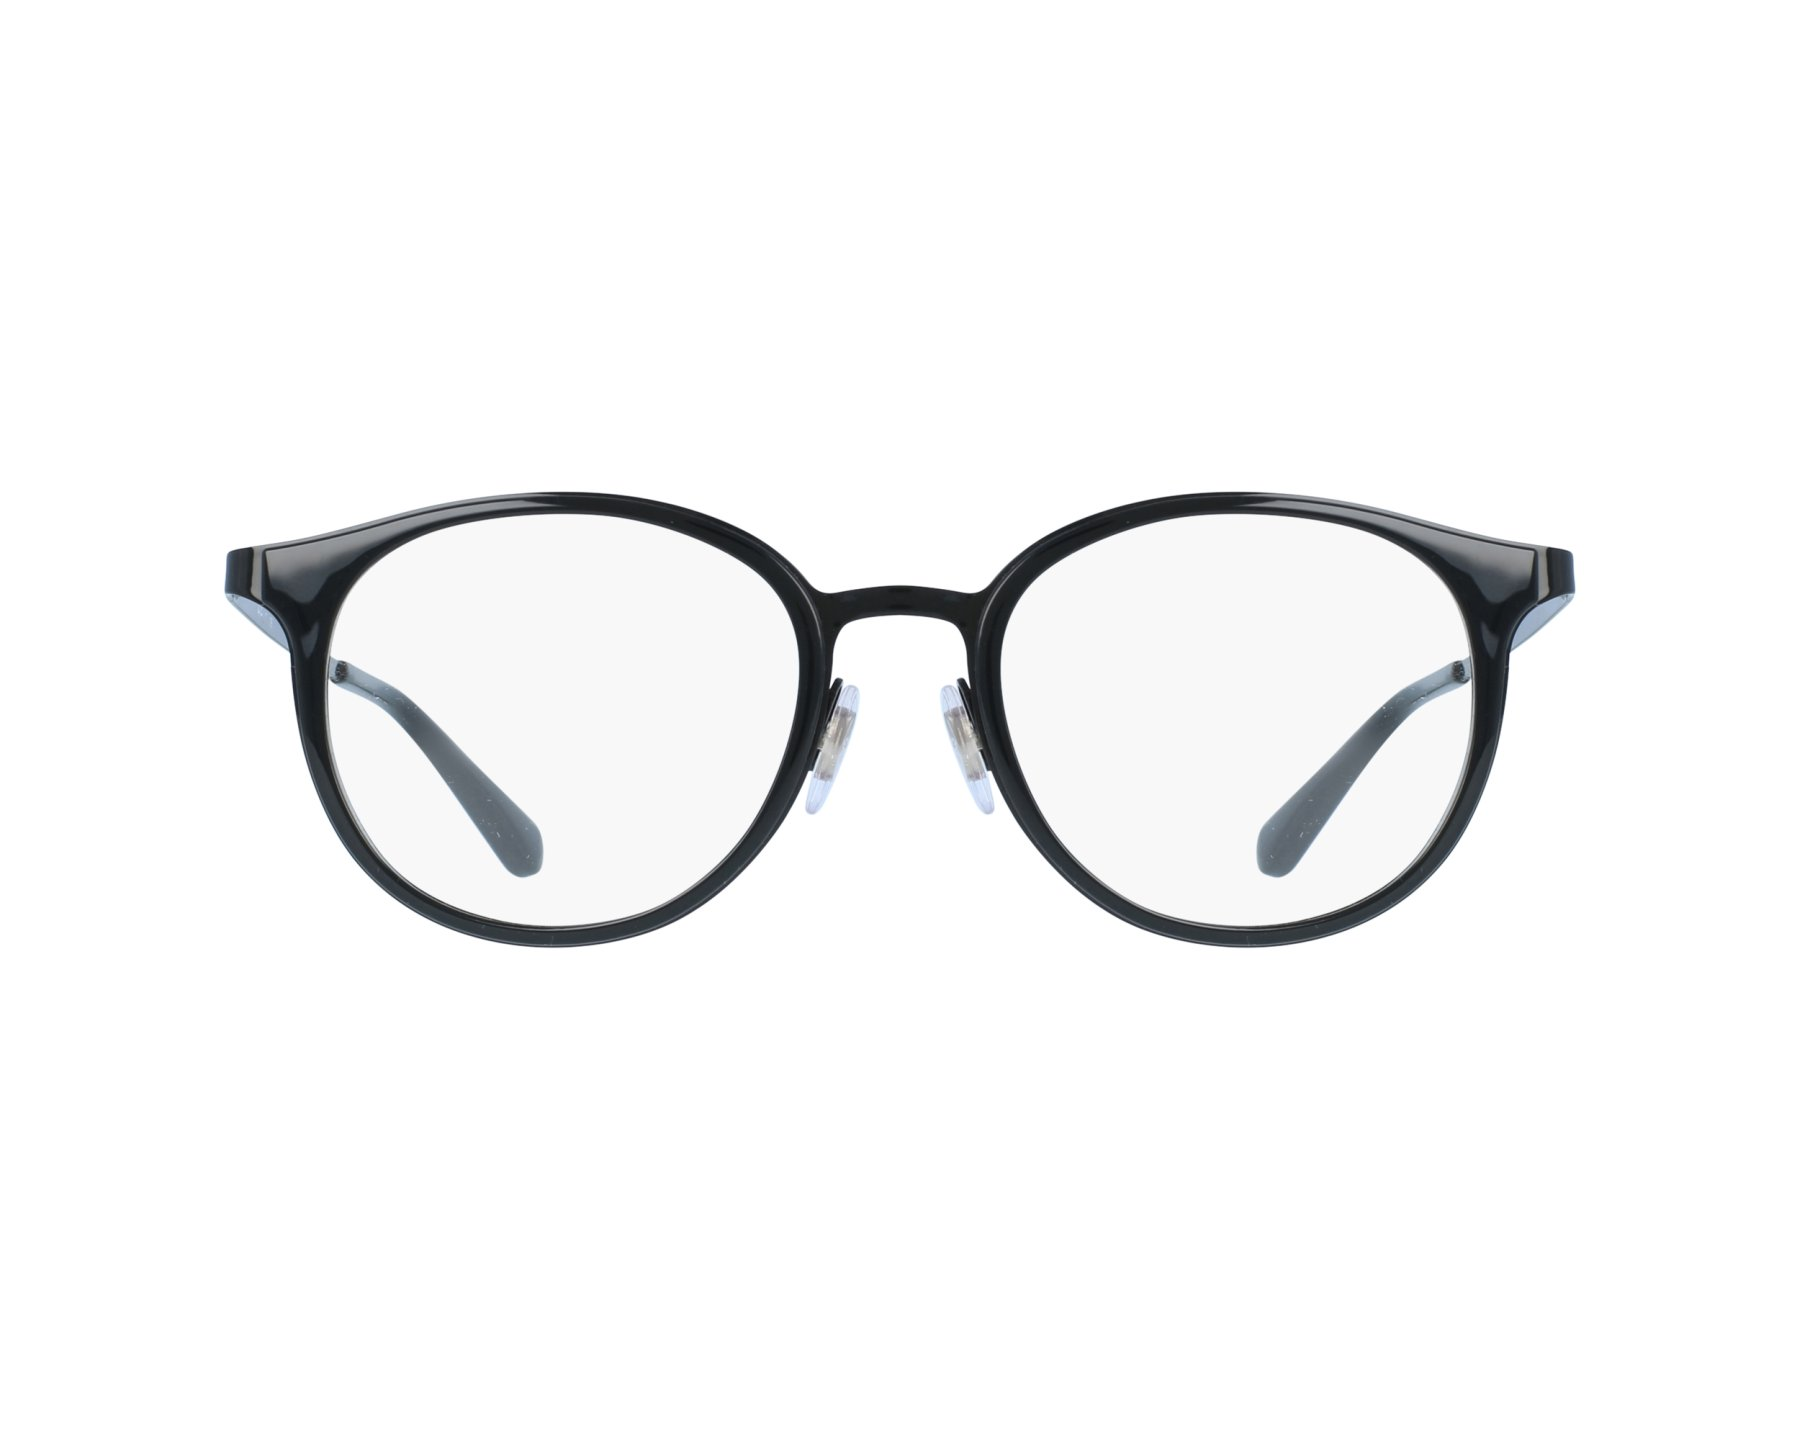 f6aa5139e2 Gafas Graduadas Ray-Ban RX-6372-M 2509 50-19 Negra vista